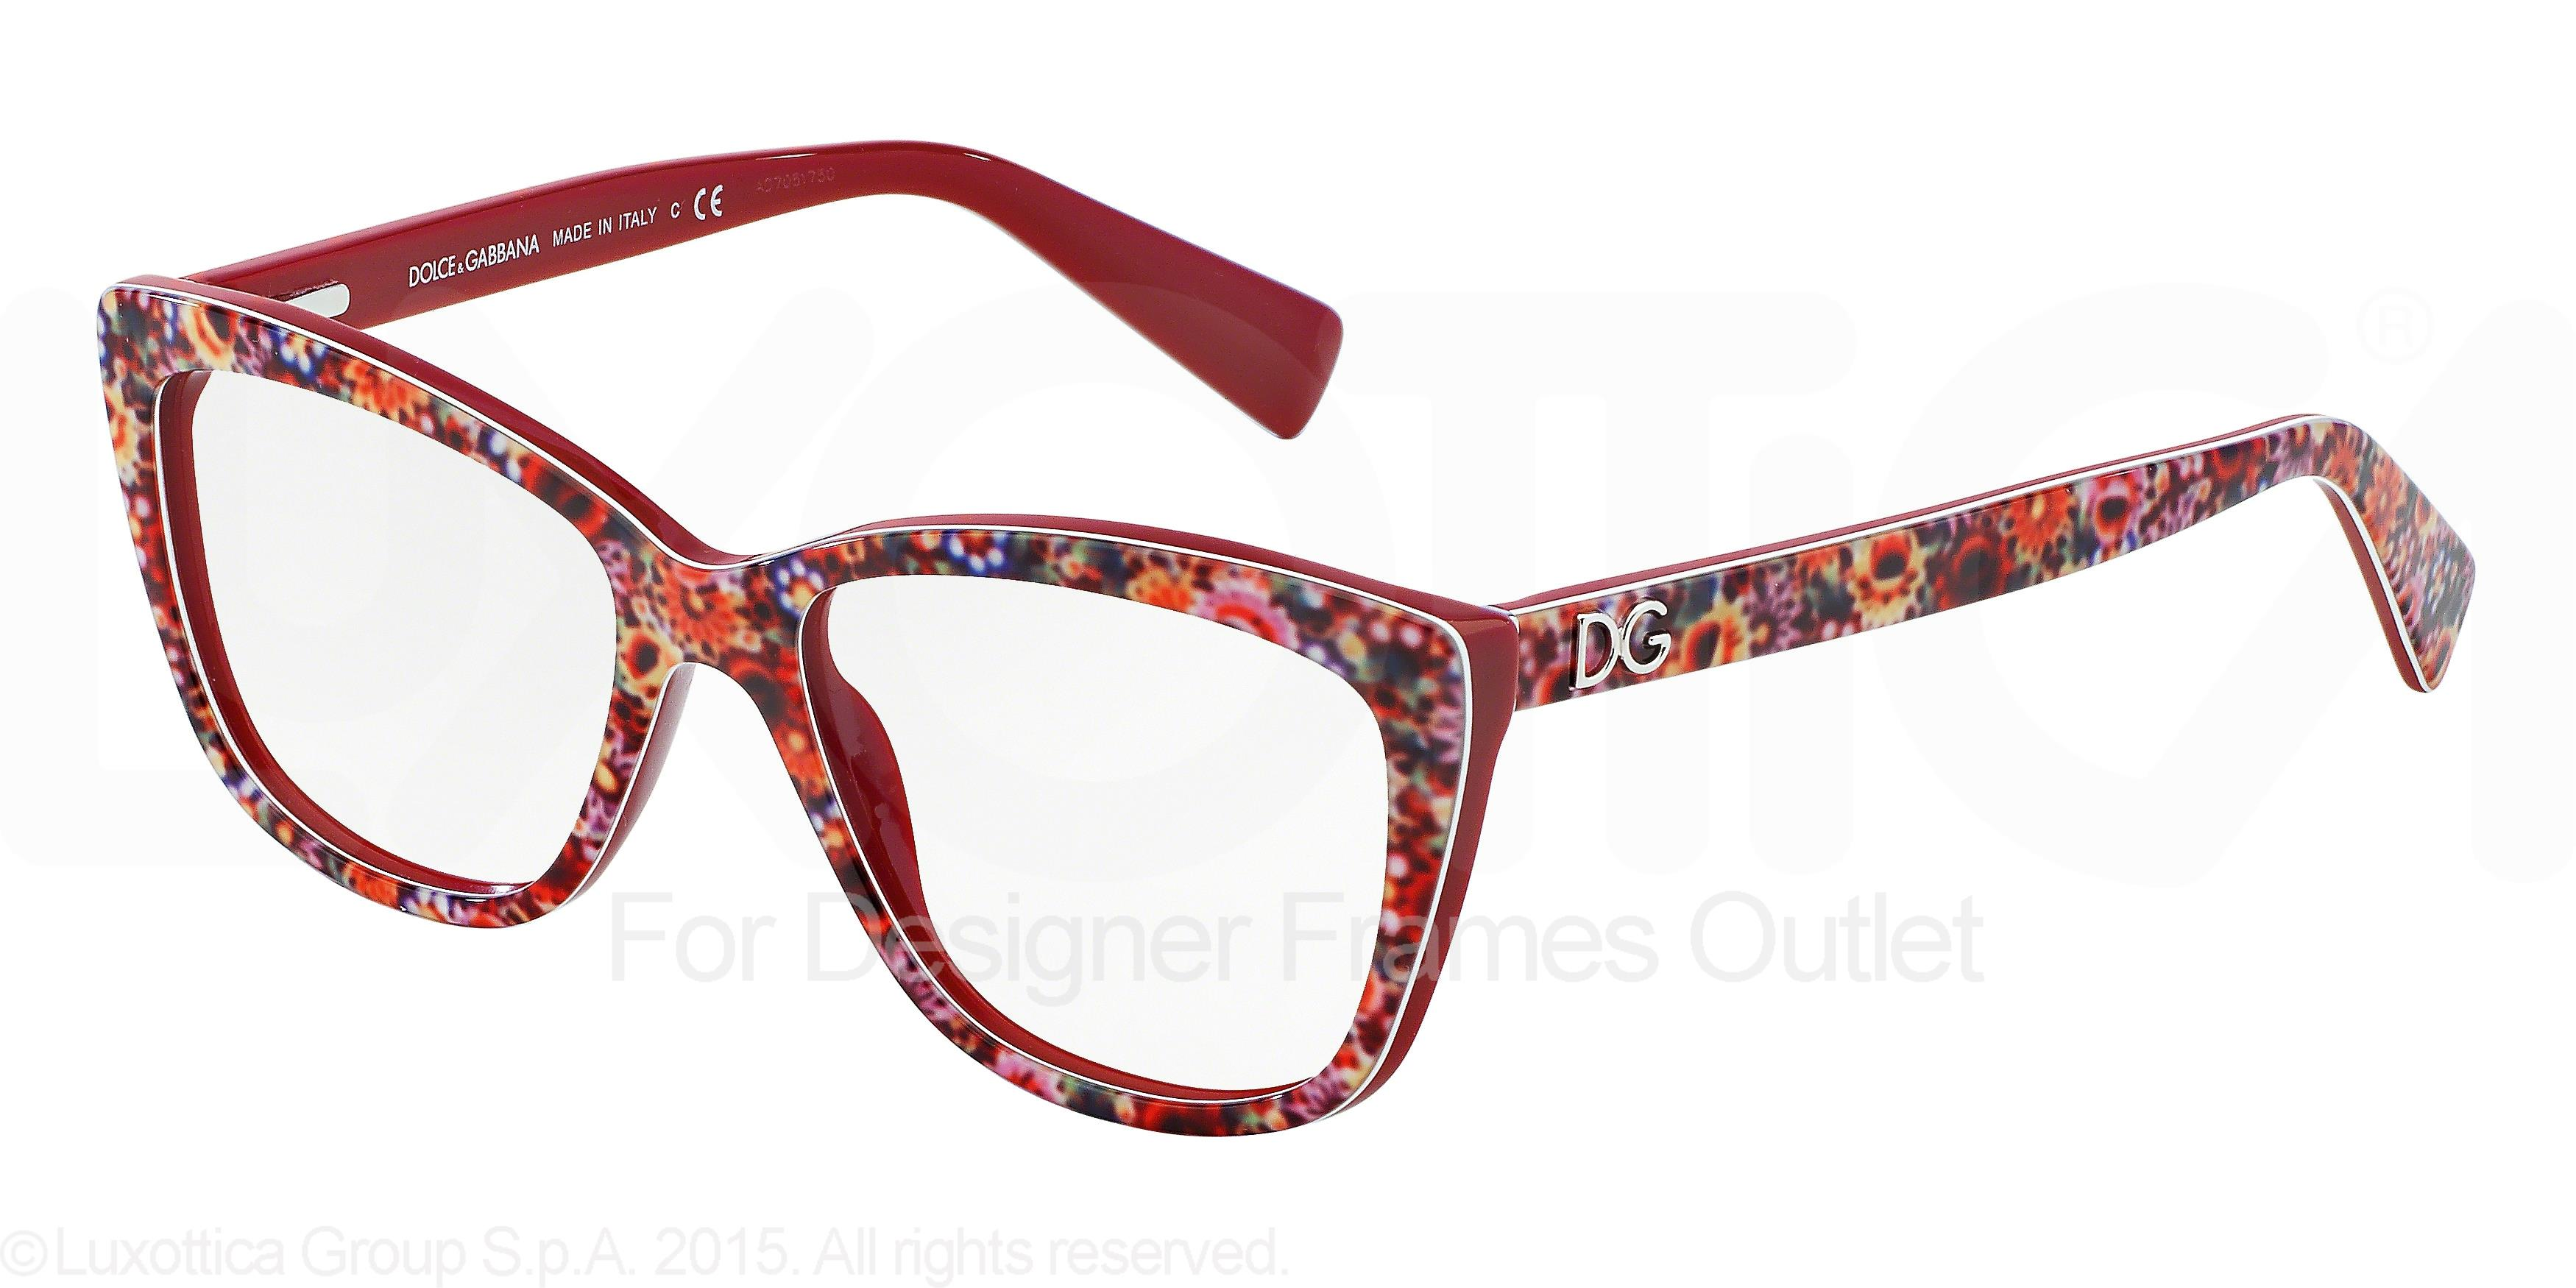 c4de89816ca Dolce   Gabbana Eyeglasses Dg3269